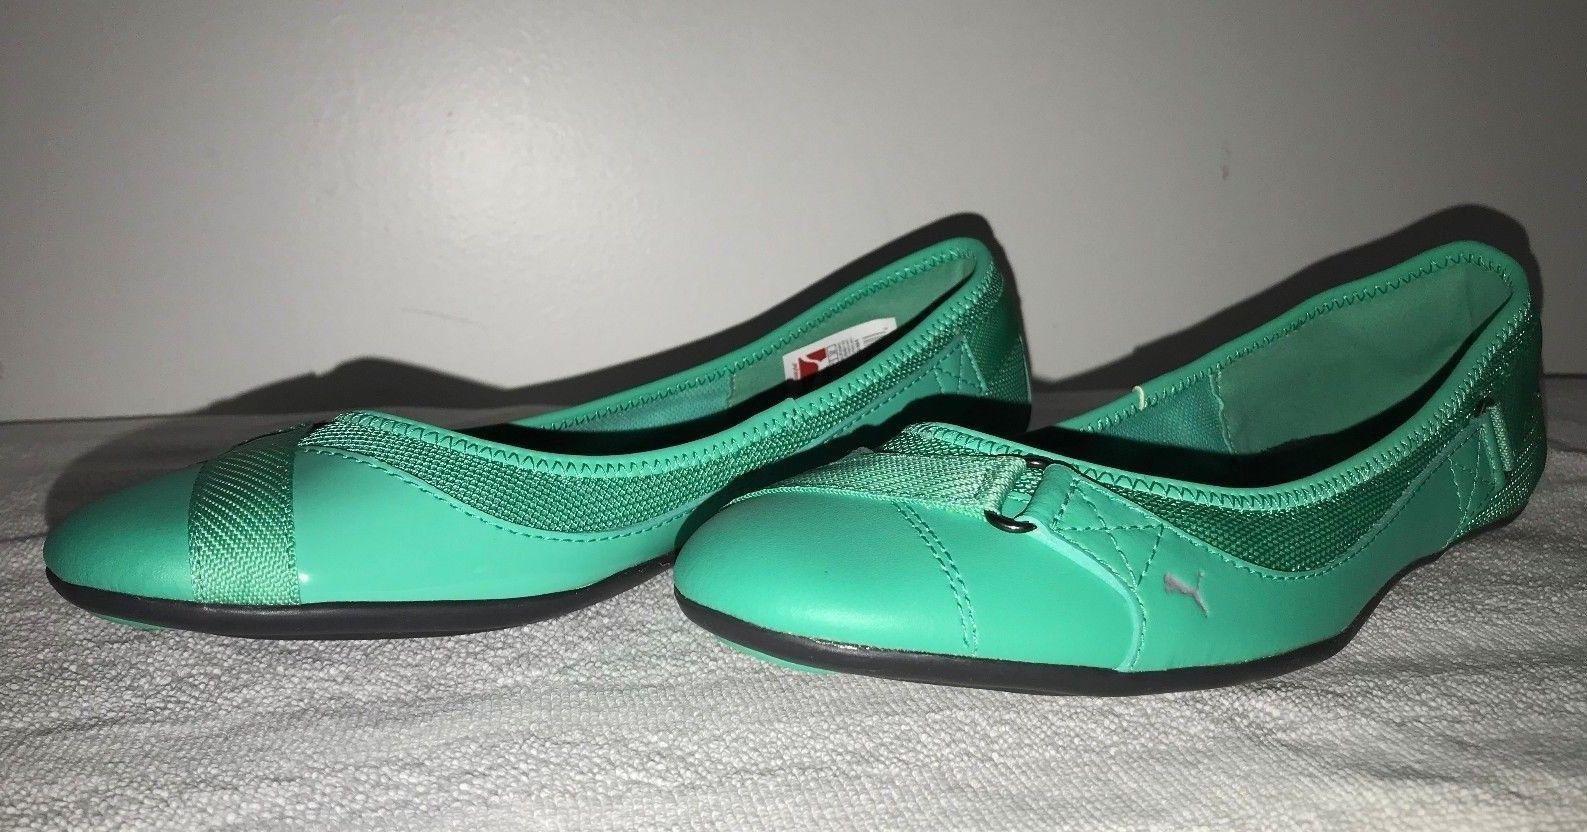 PUMA BIXLEY GLAMM BALLET FLATS WOMAN SHOES 354541 03 GREEN MINT LEAF Ballarina